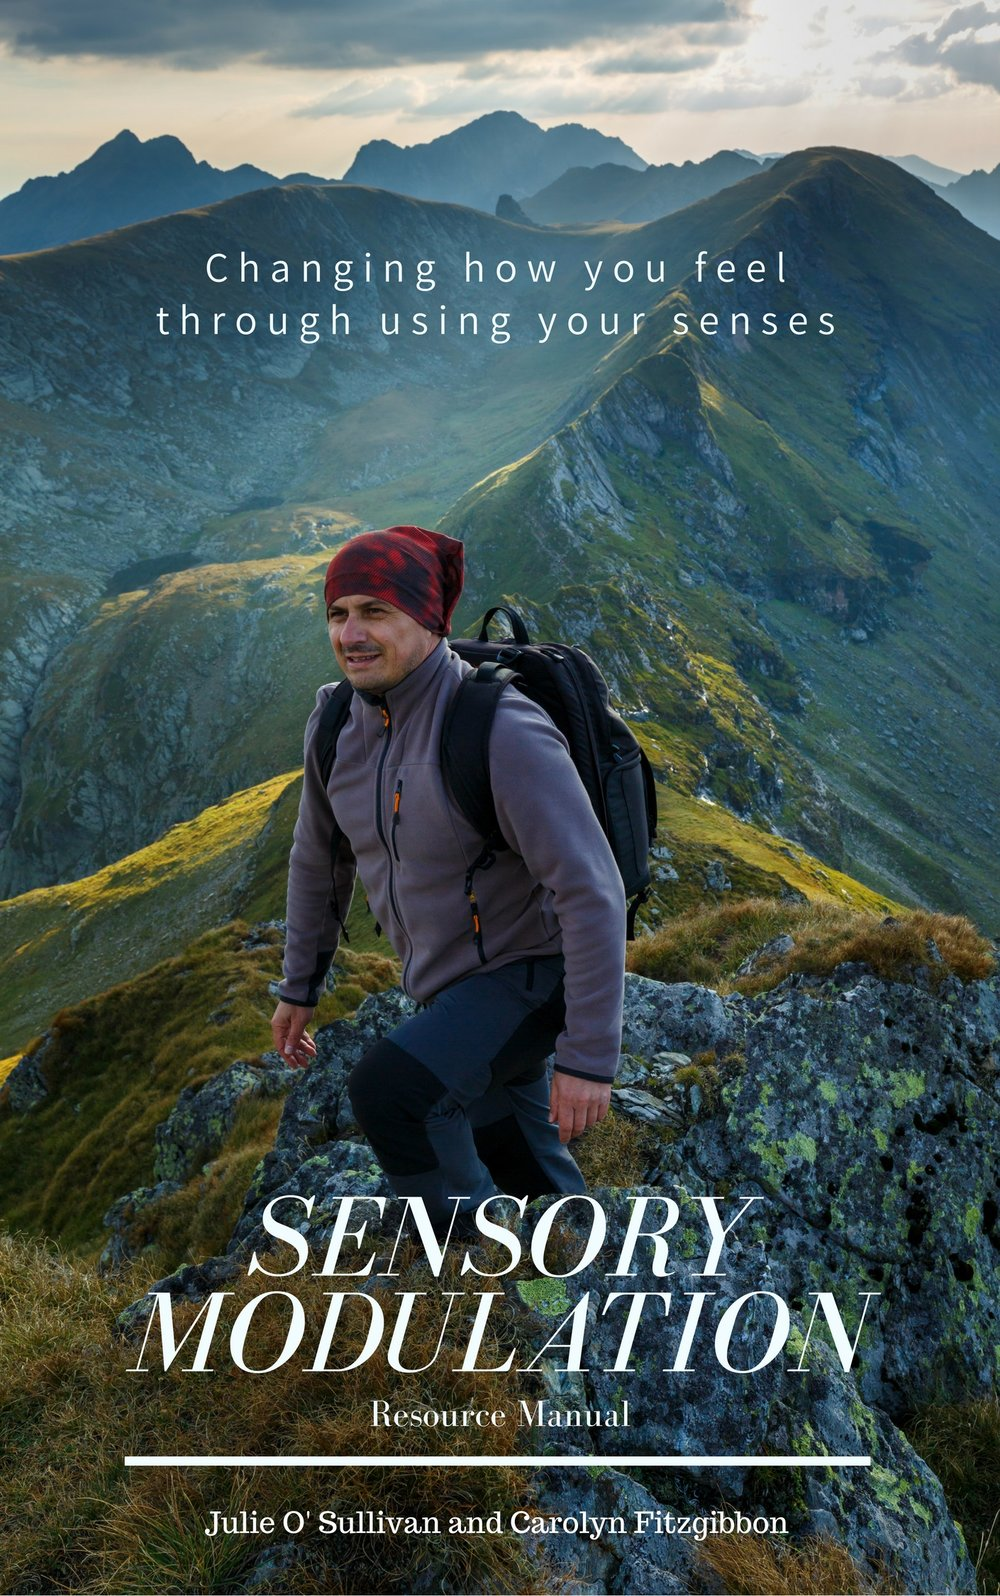 Sensory Modulation Resource Manual